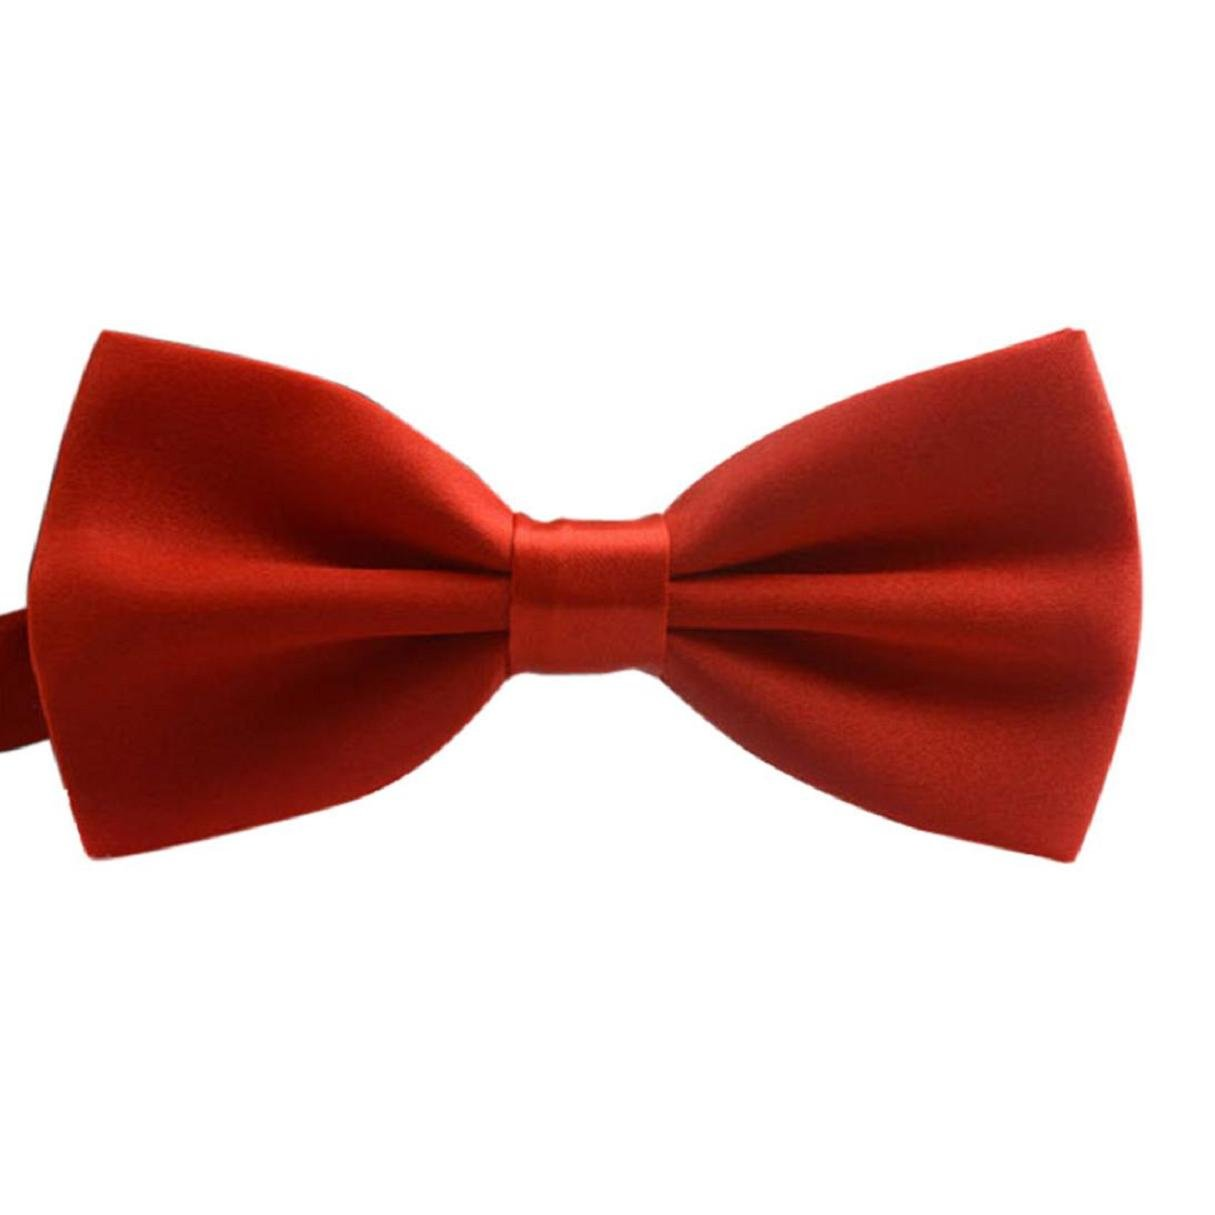 Classic Novelty Mens Adjustable Tuxedo Wedding Bow Tie Necktie Witspace Tuxedo Neckties